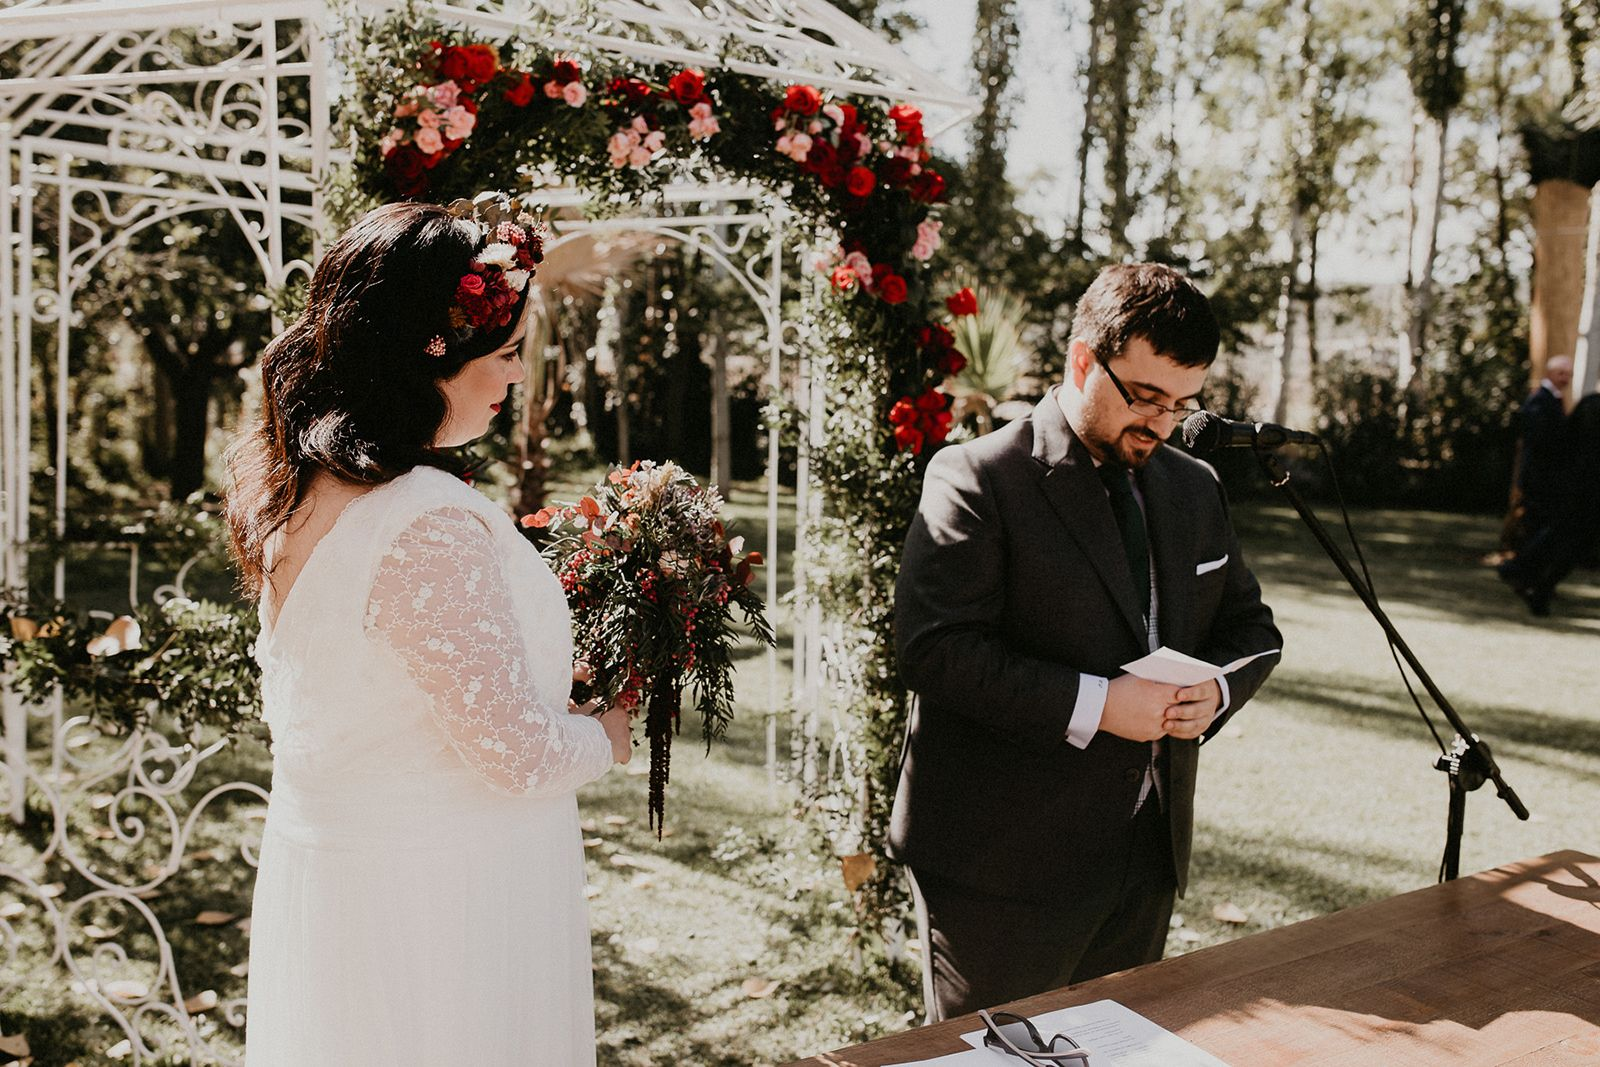 La boda de Fede y Maite en Andújar-1326JOYZAMORALUTZASE